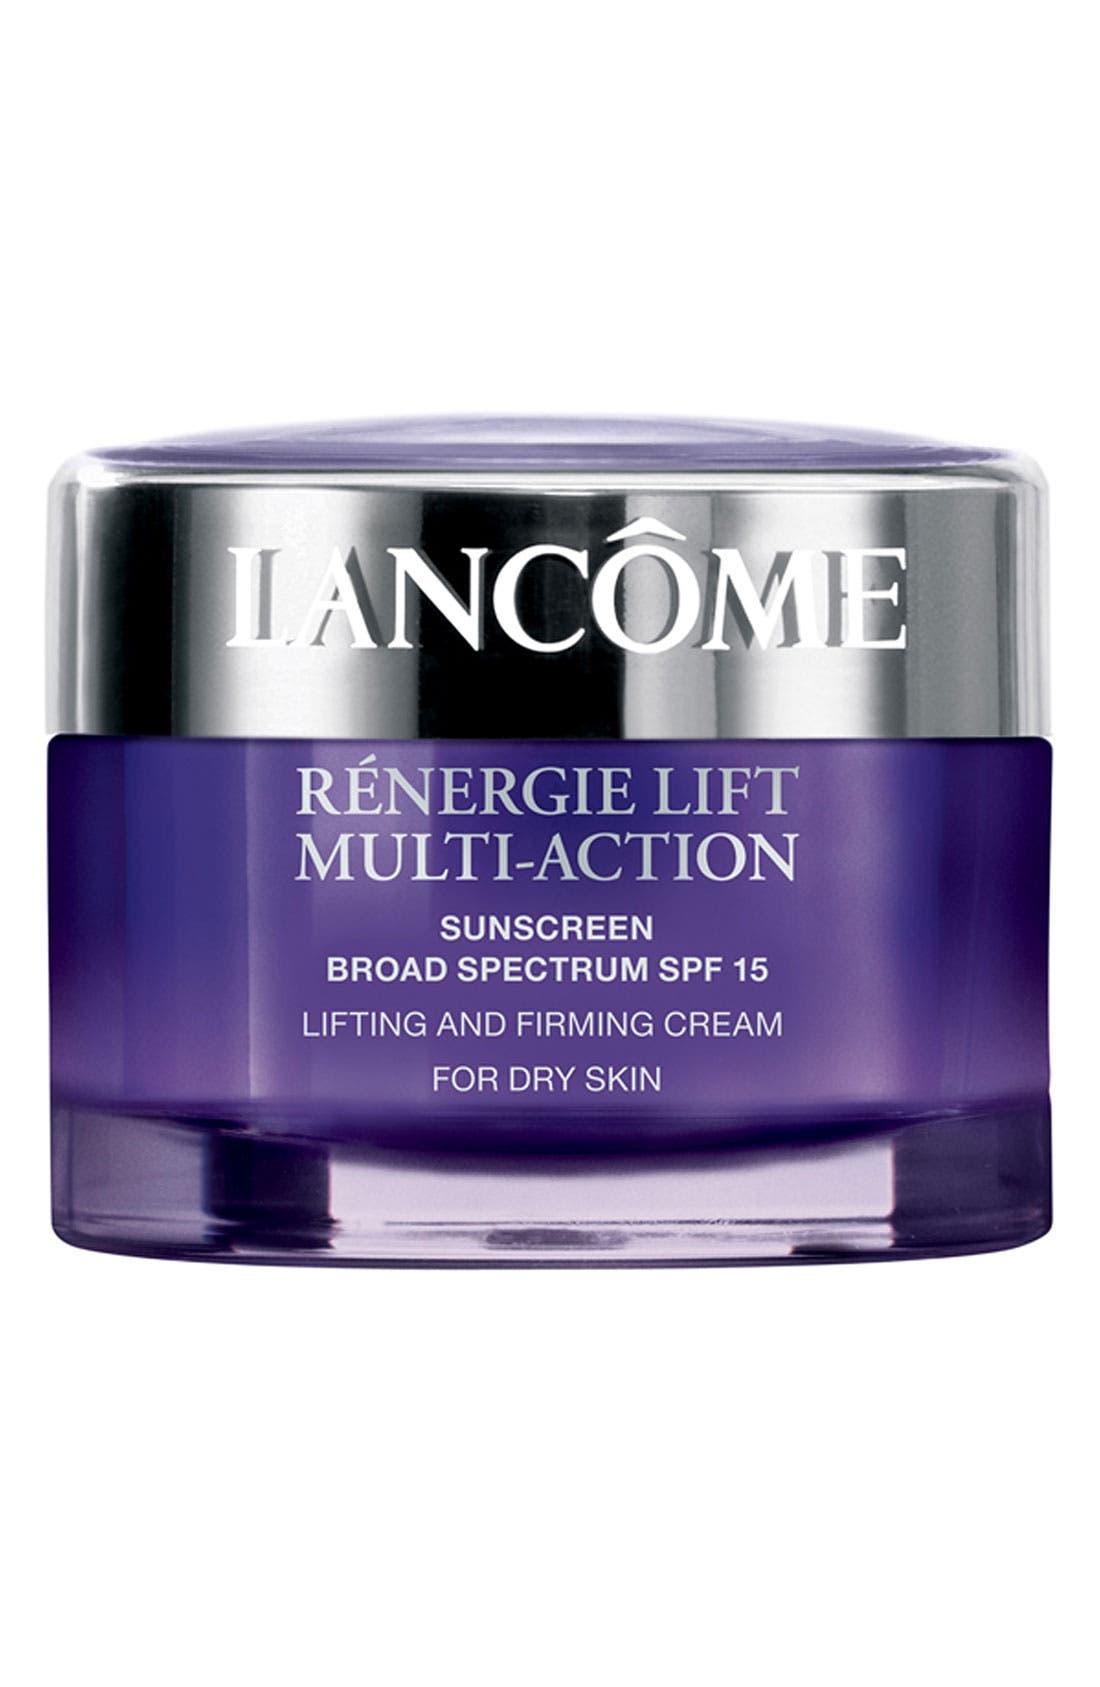 Lancome Renergie Lift Multi Action Moisturizer Cream Spf 15 For Dry Skin